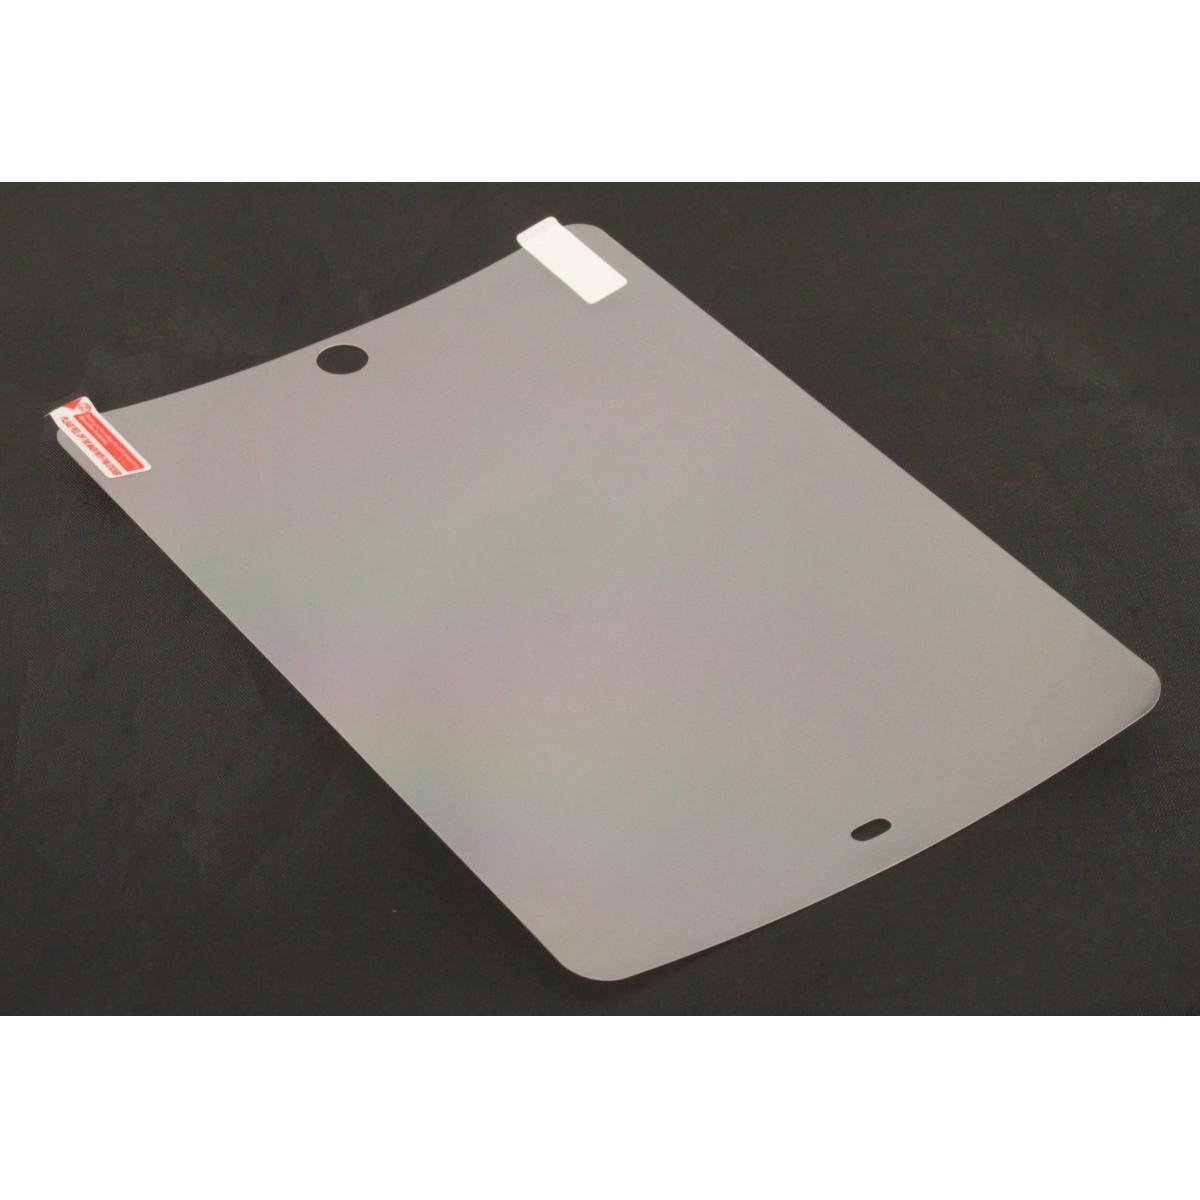 Película Protetora para Ipad Mini - Fosca